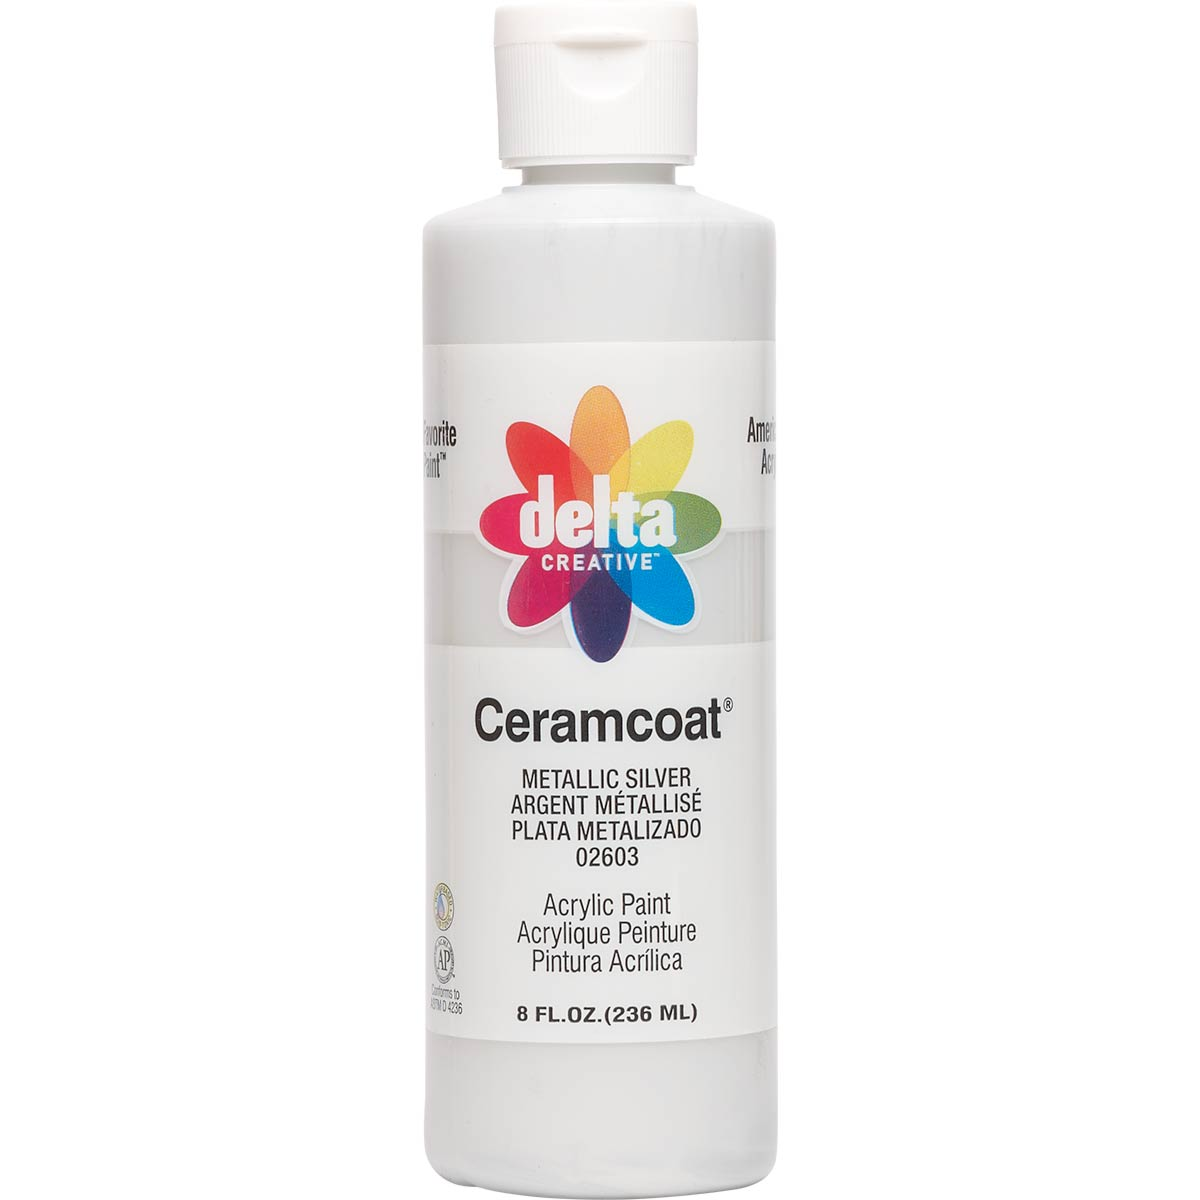 Delta Ceramcoat ® Acrylic Paint - Metallic Silver, 8 oz.